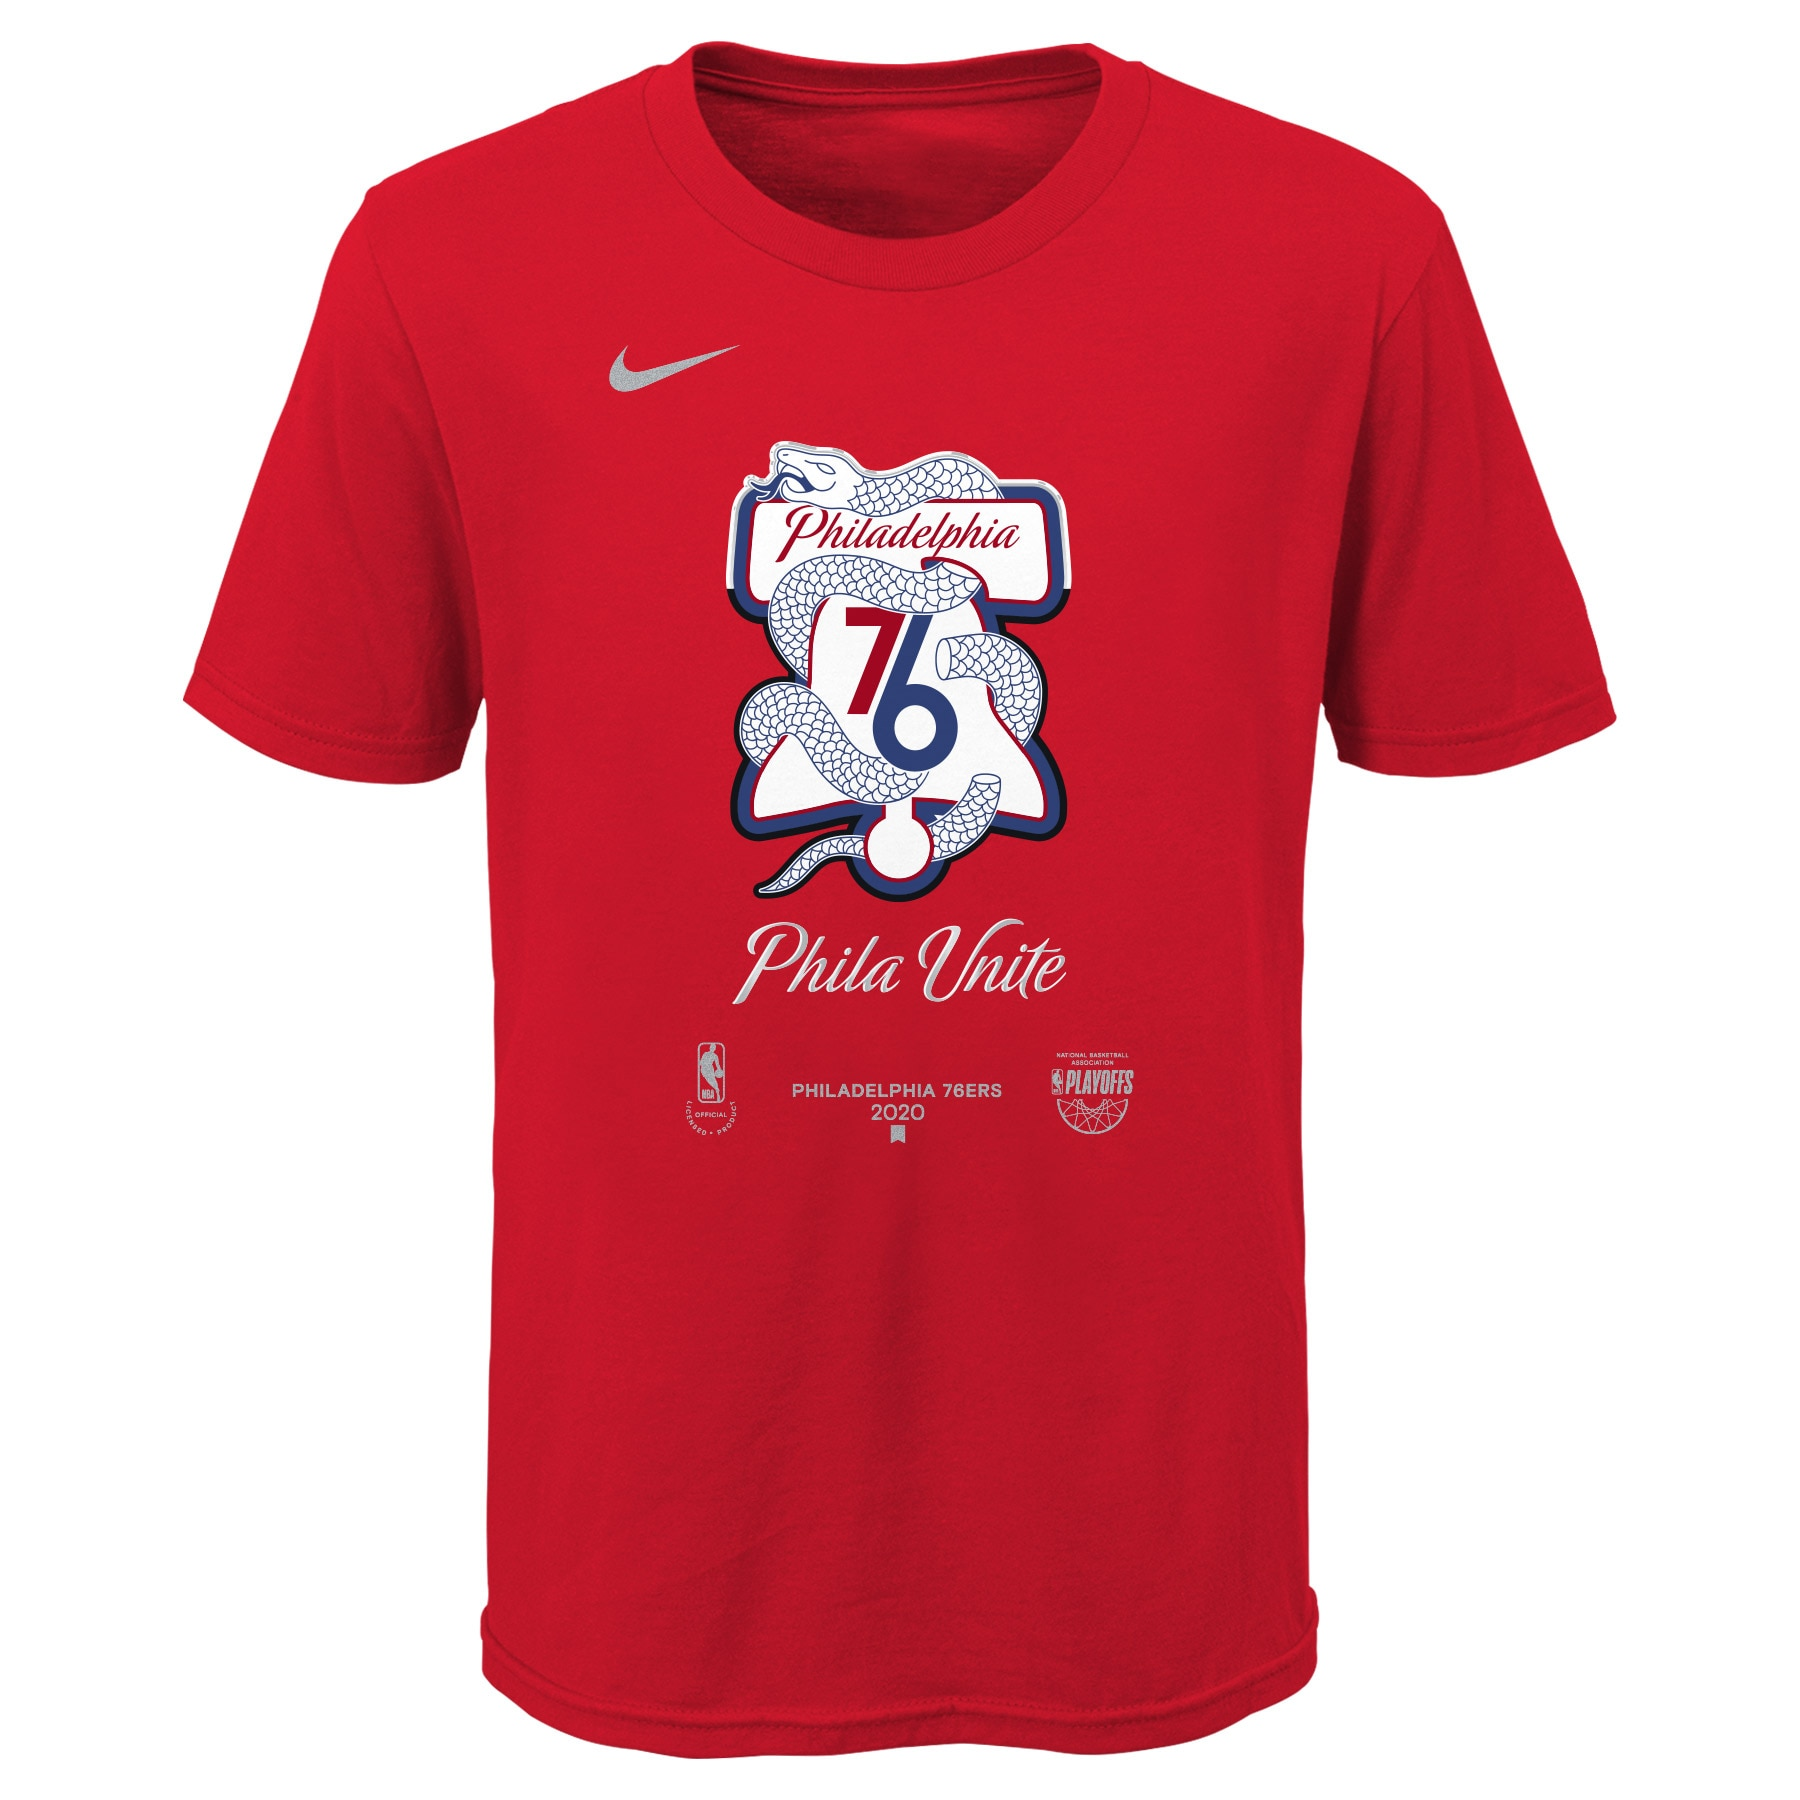 Philadelphia 76ers Nike Youth 2020 NBA Playoffs Bound Mantra T-Shirt - Red